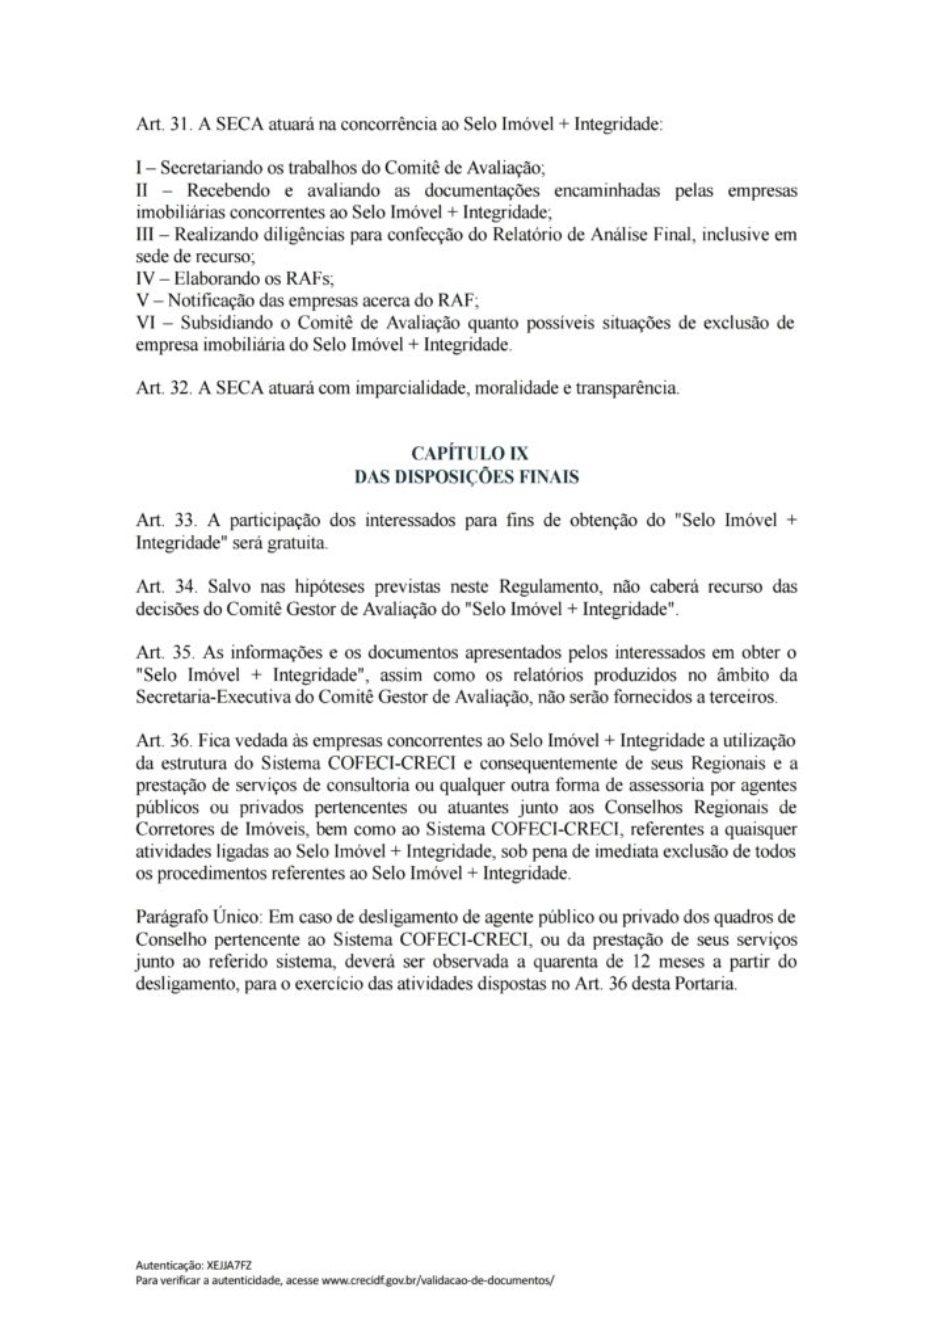 PORTARIA Nº 58 - SELO IMÓVEL + INTEGRIDADE.pdf_page_10